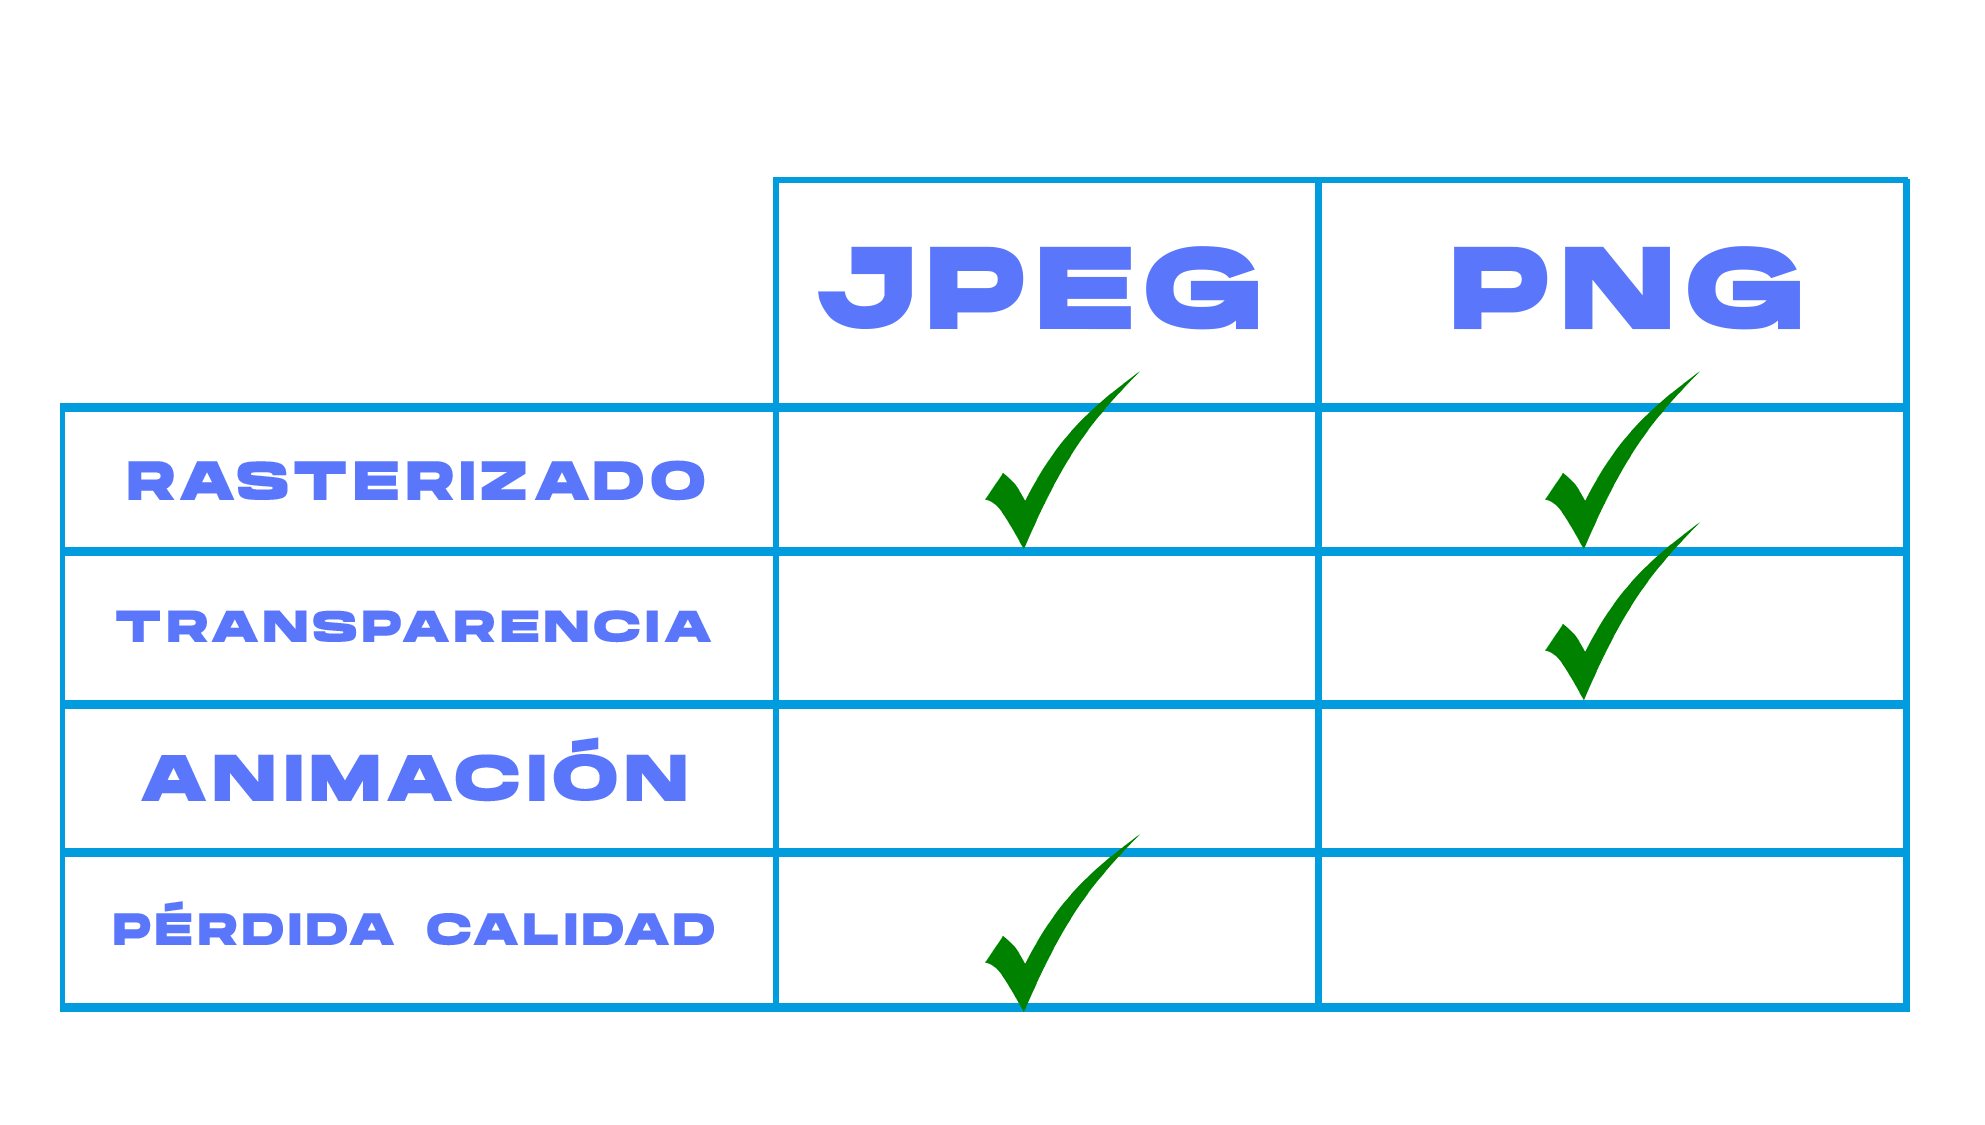 Jpeg vs Png Piano Marketing Granada